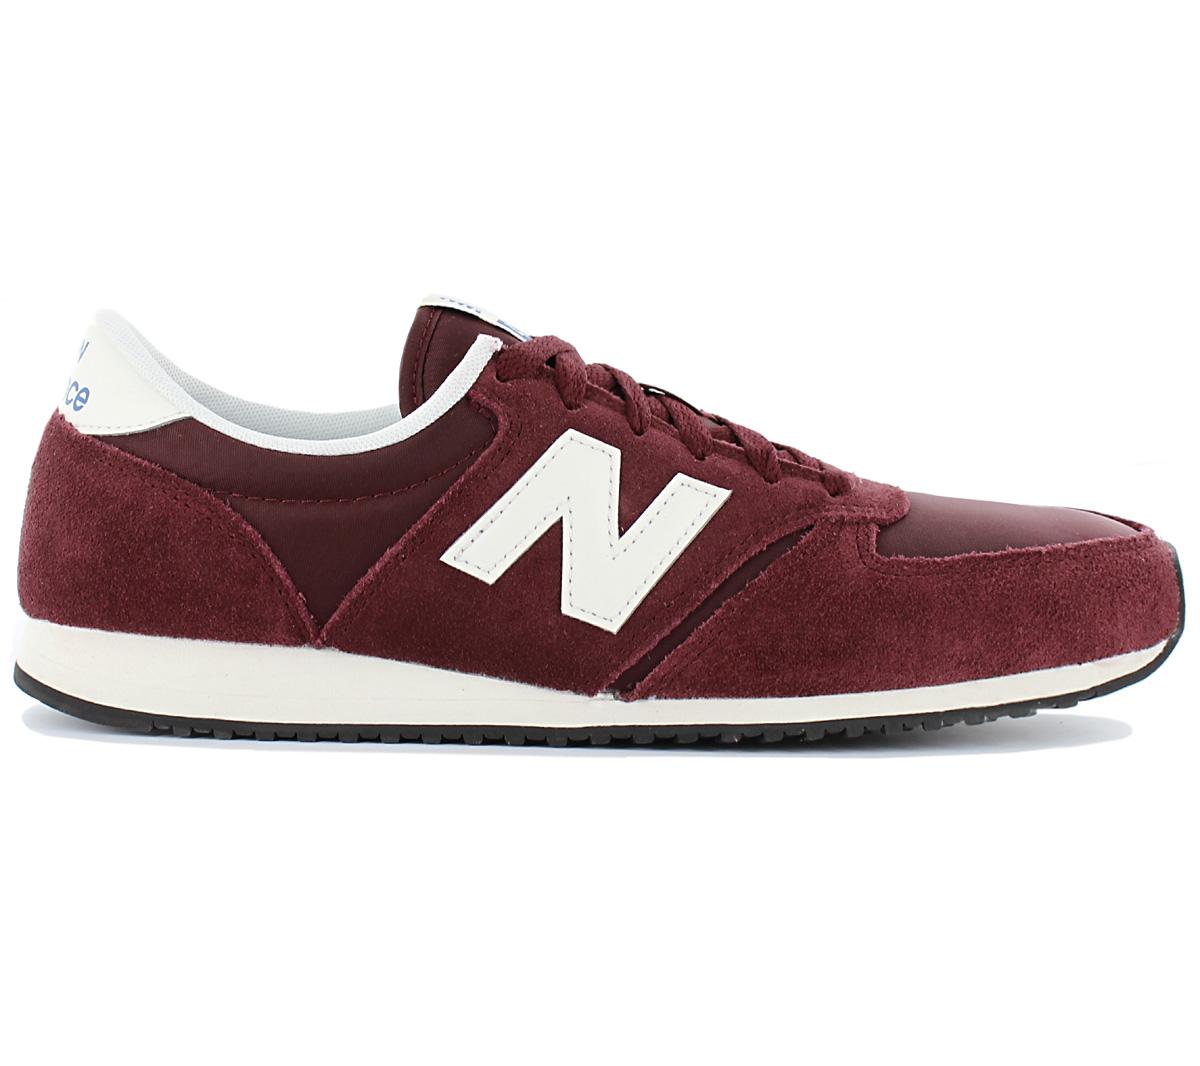 New Balance Sneaker U420 Herren Fashion Classic Sneaker Balance Schuhe Retro Leder Turnschuh 420 b97e79